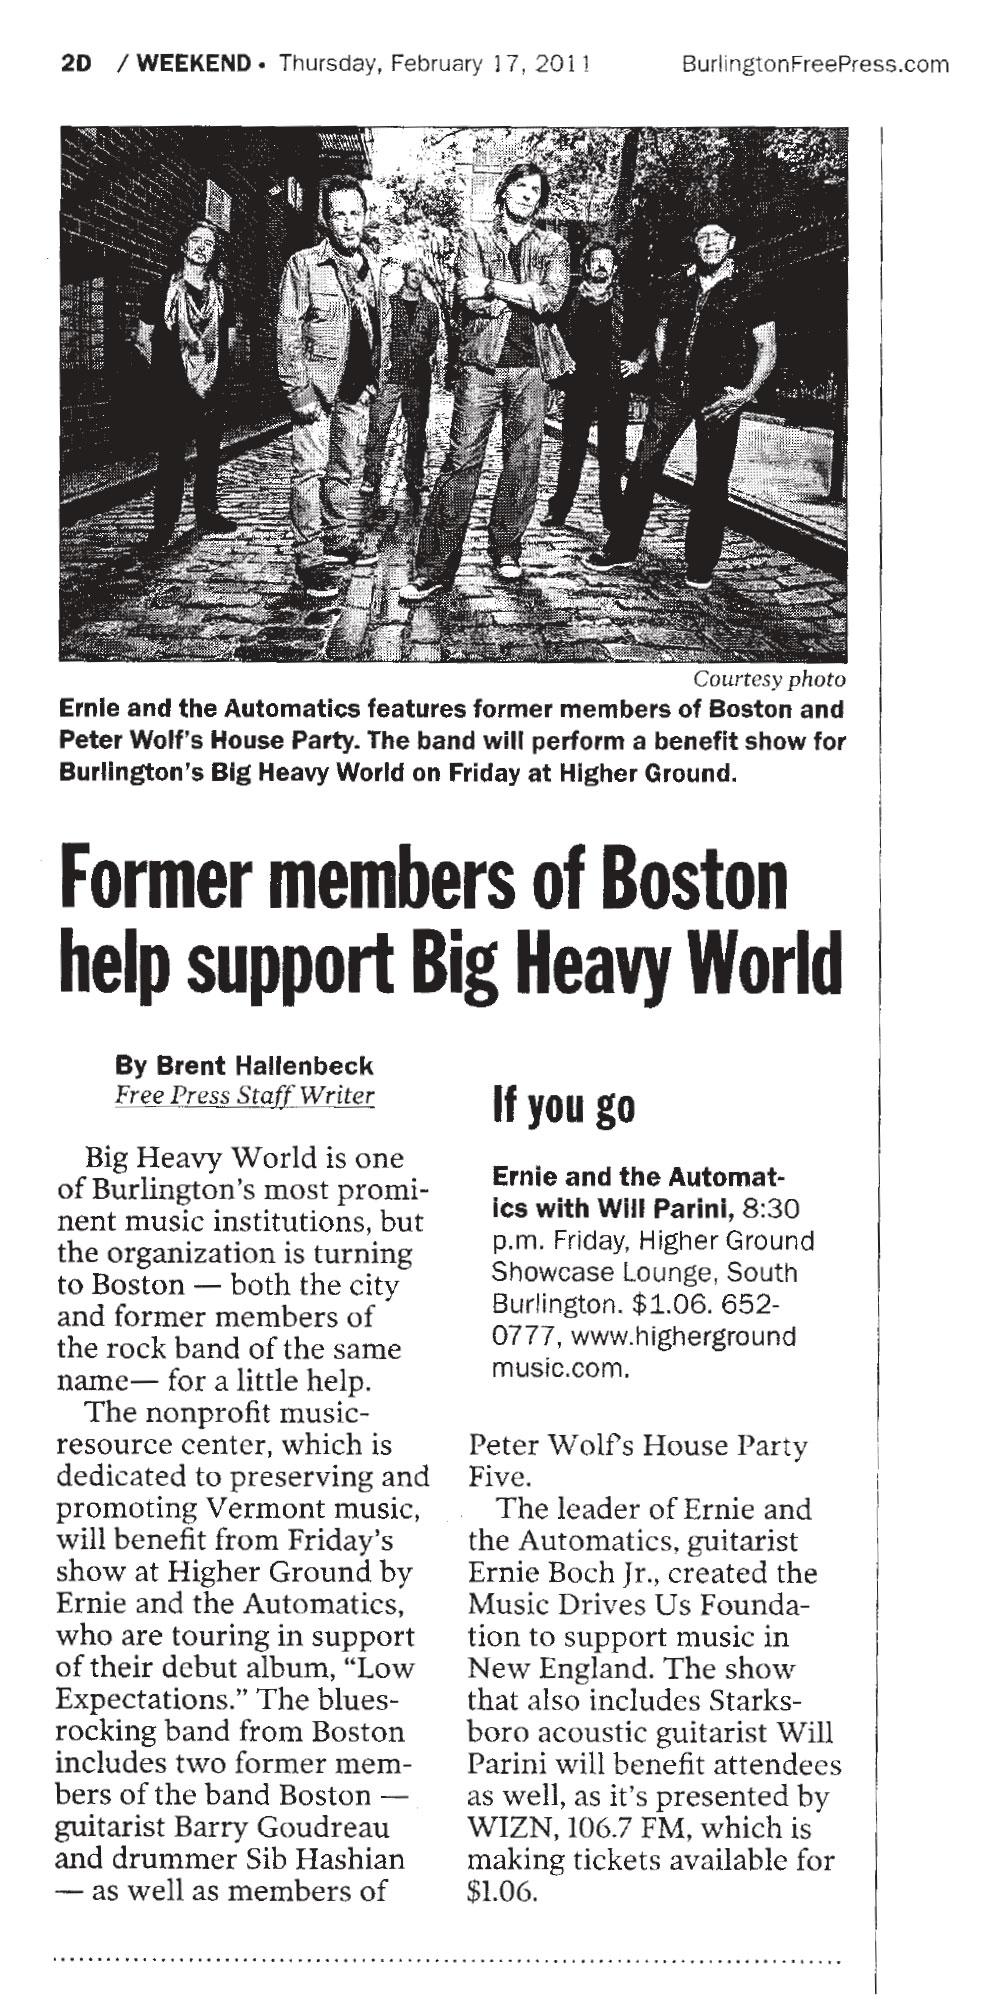 2011-02_BostonBHWBenefit.jpg